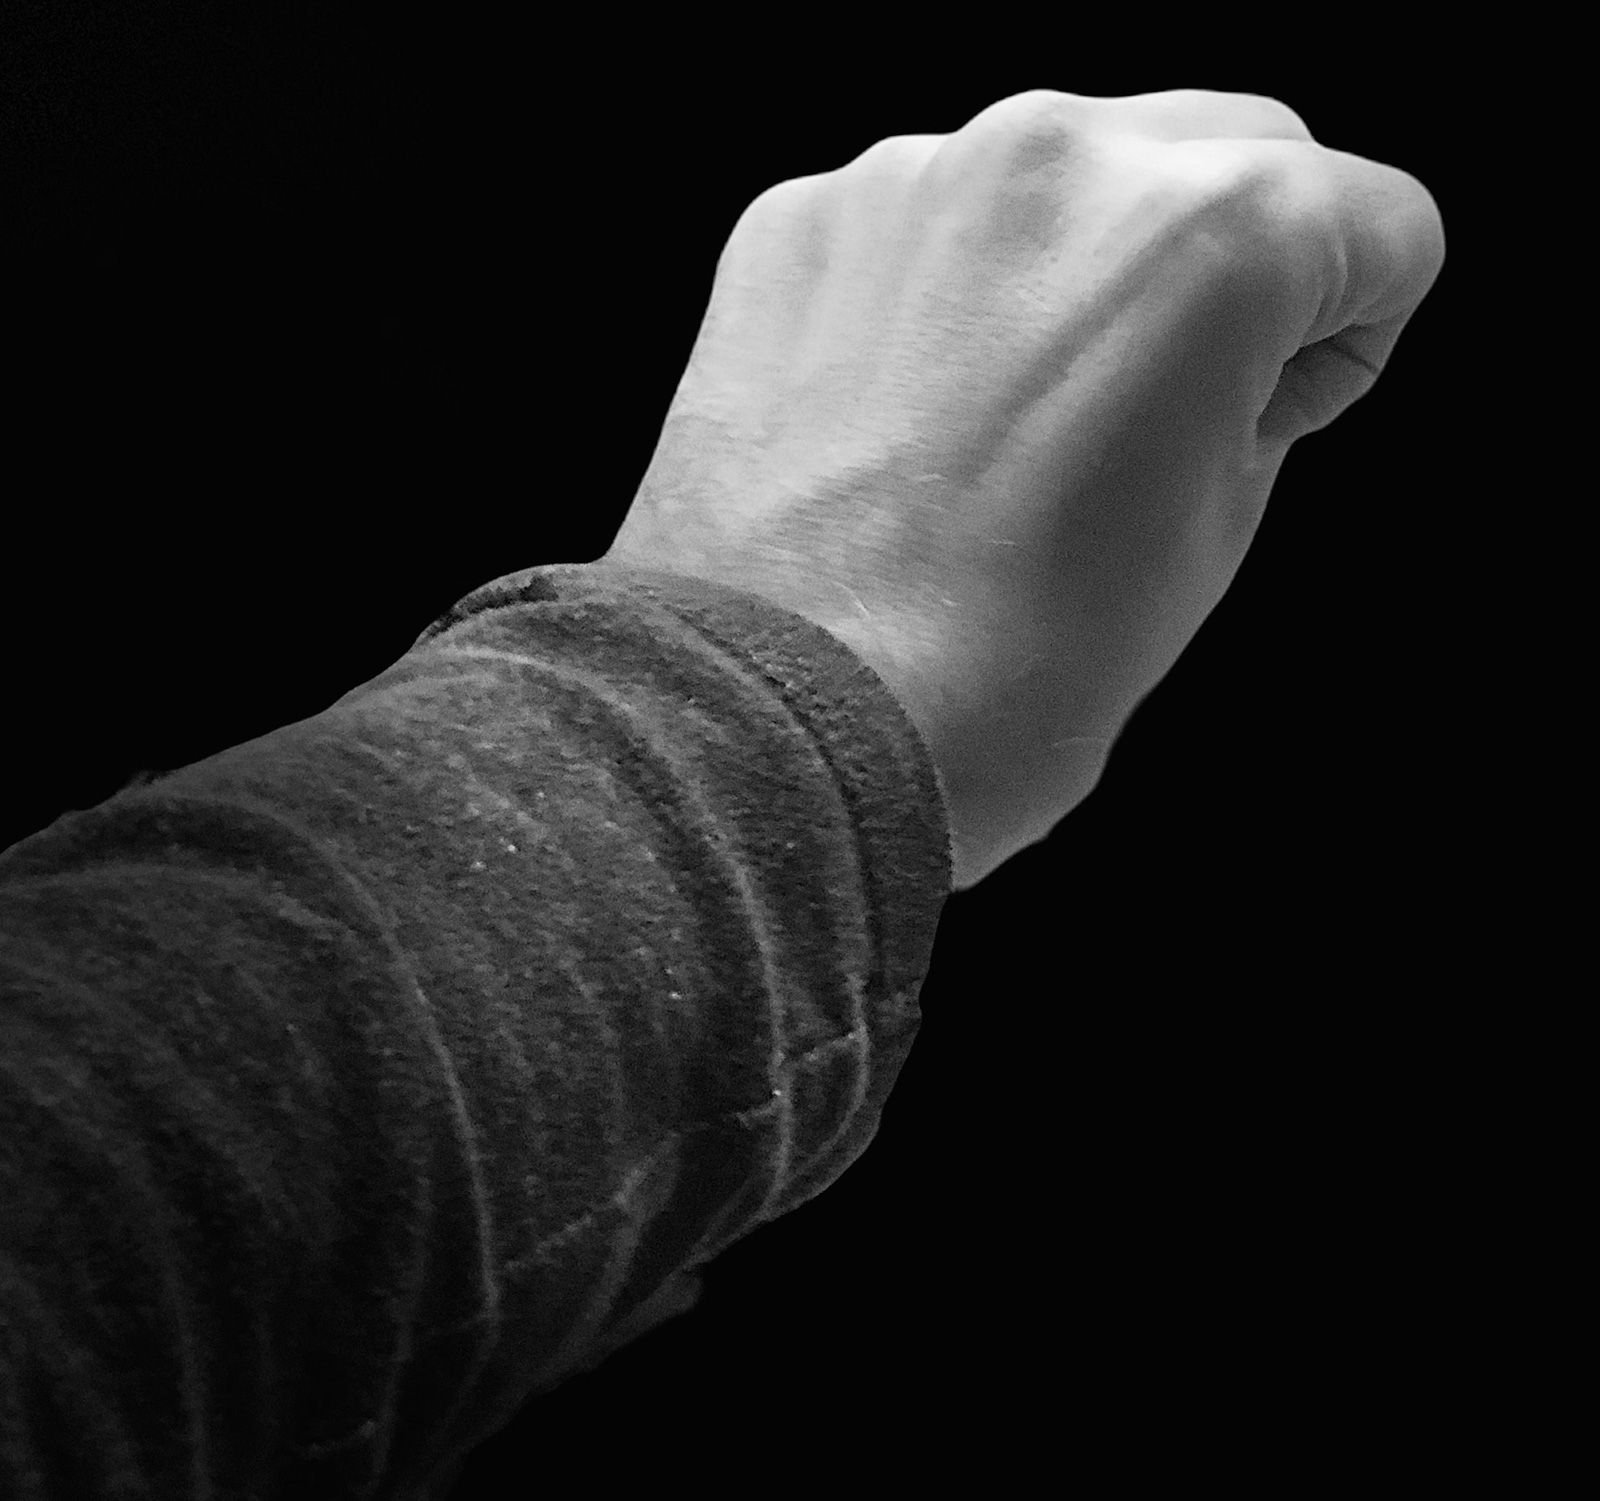 Foto retrato de un puño